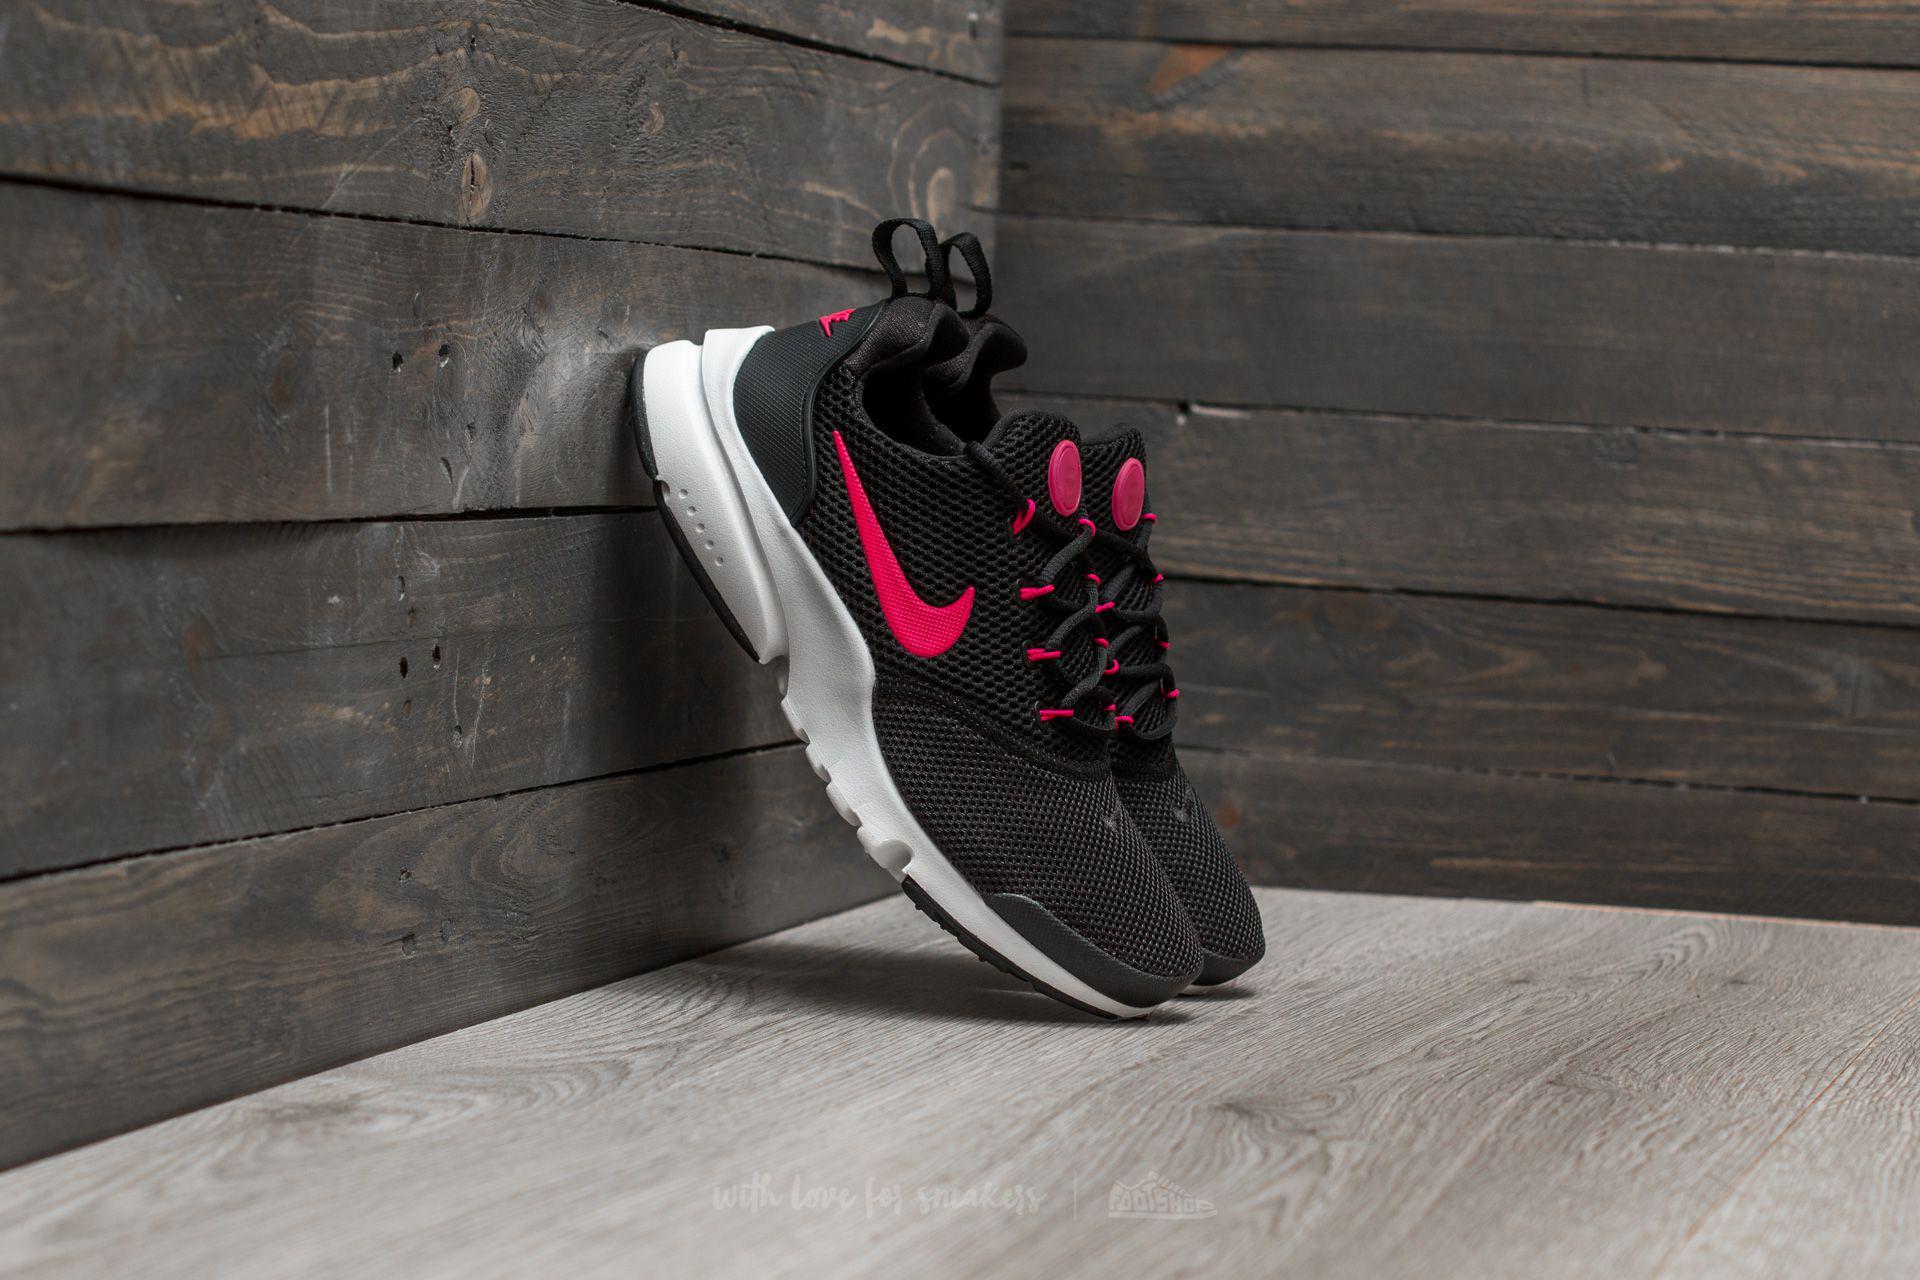 67b34f6a247a Lyst - Nike Presto Fly (gs) Black  Rush Pink-white